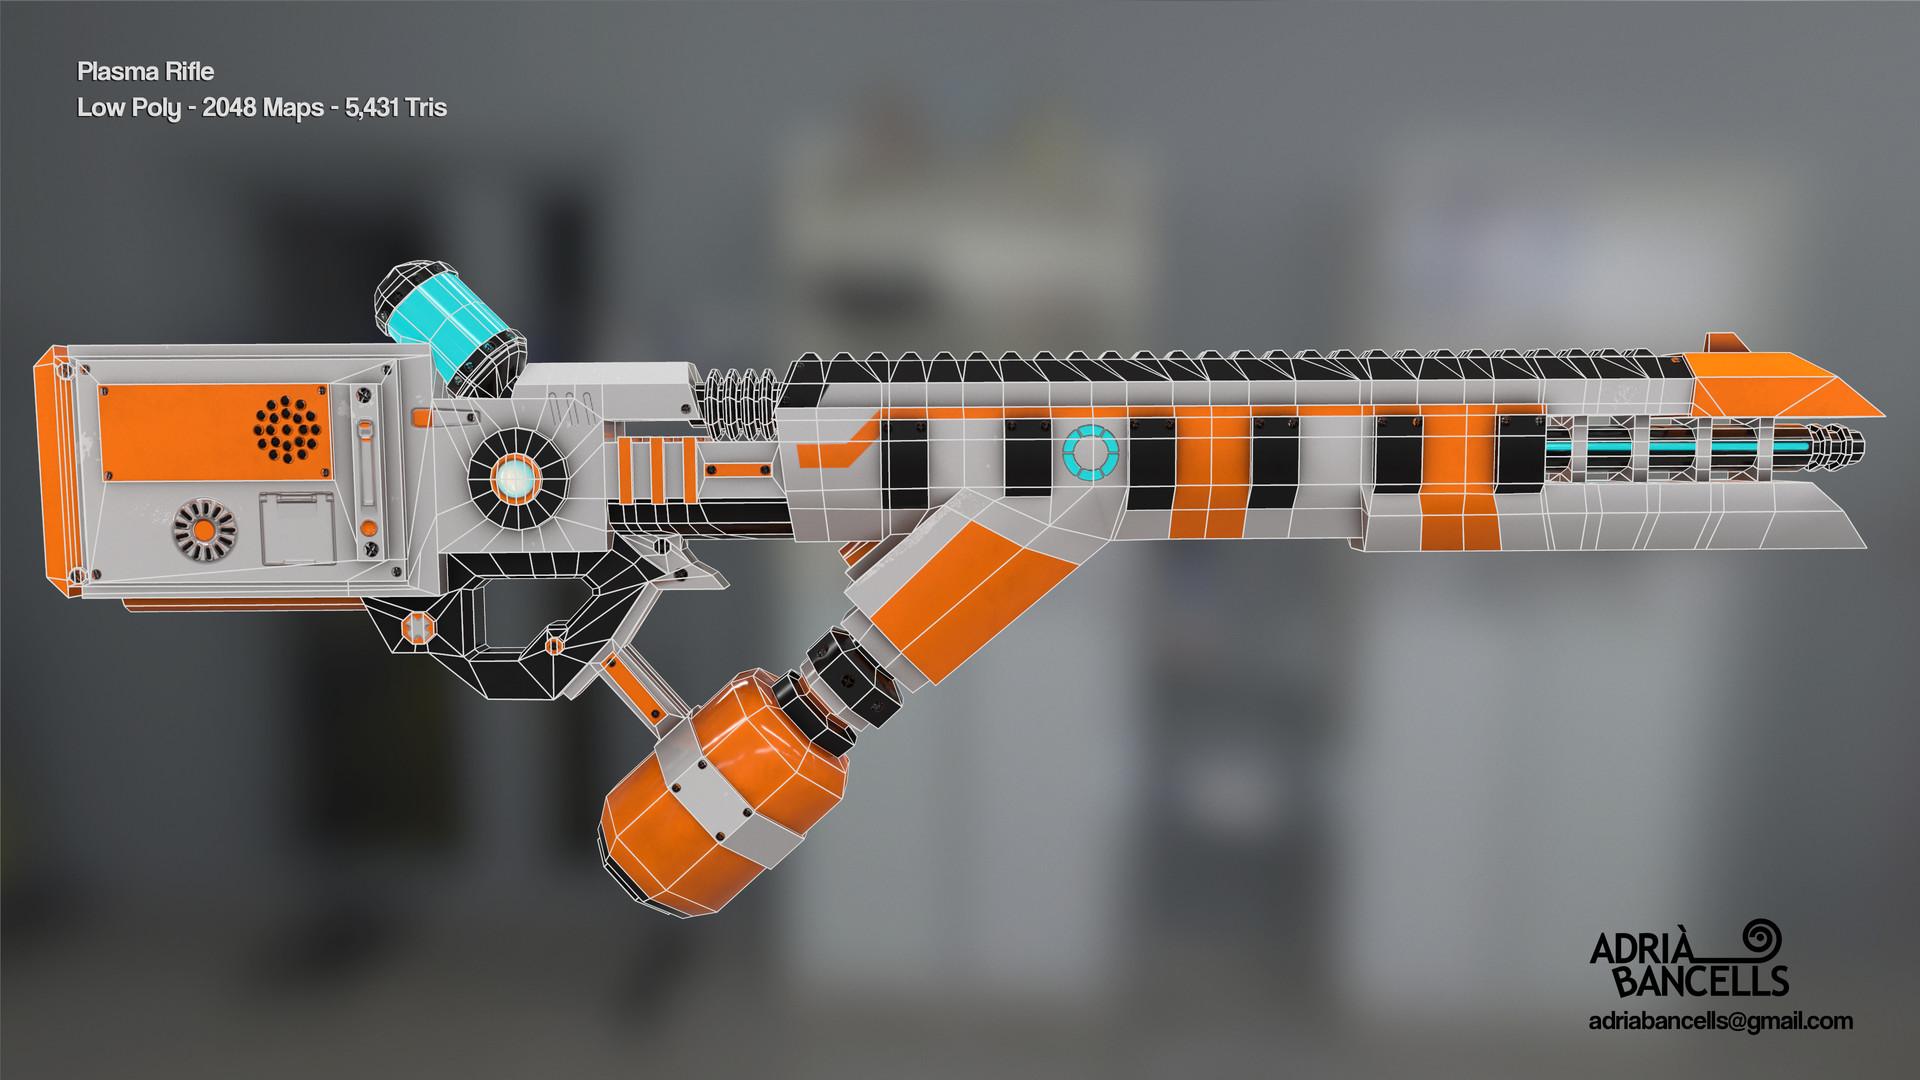 Adria bancells plasma rifle3